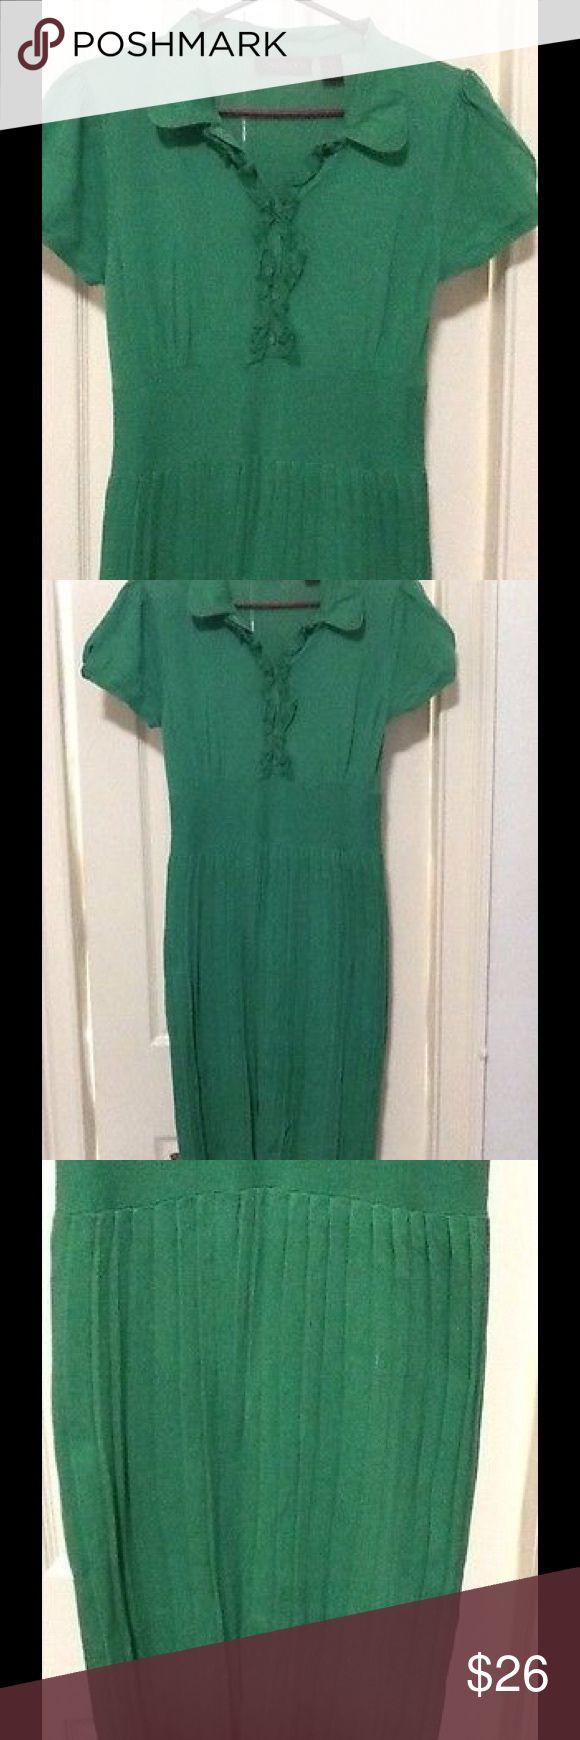 Green dress Chadwick's Kelly green dress size 12 knit style with pleats in the bottom cotton Chadwicks Dresses Midi